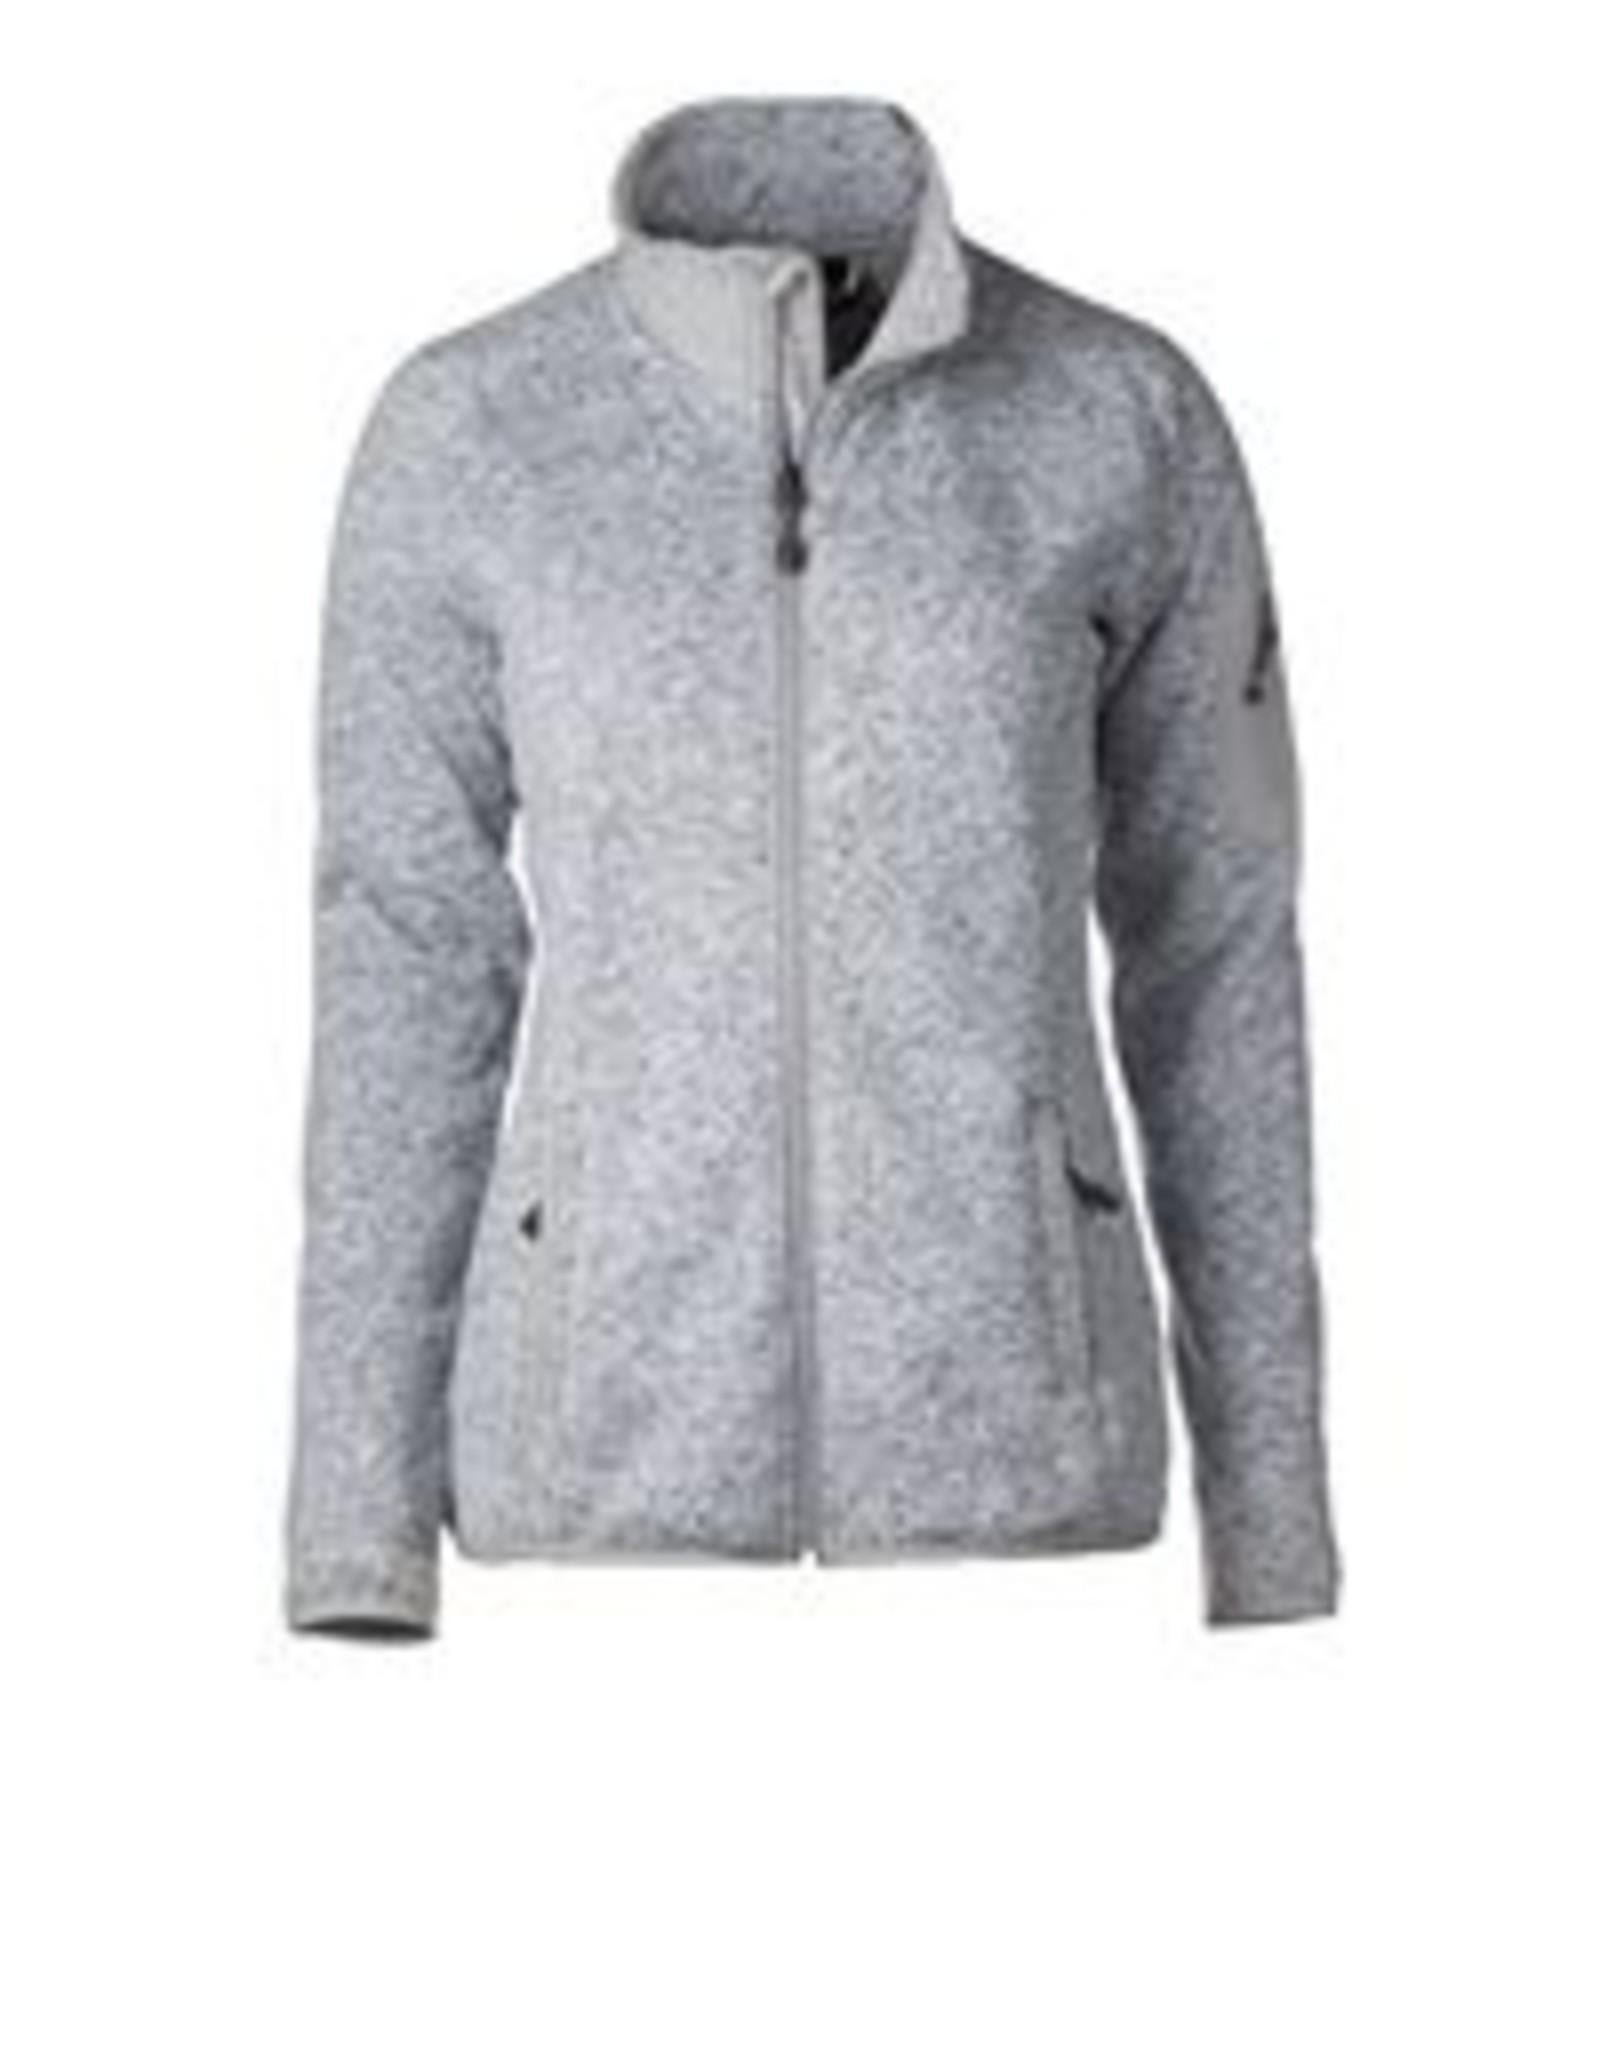 Green Giftz Women's Villa Sweater Jacket *FINAL SALE*